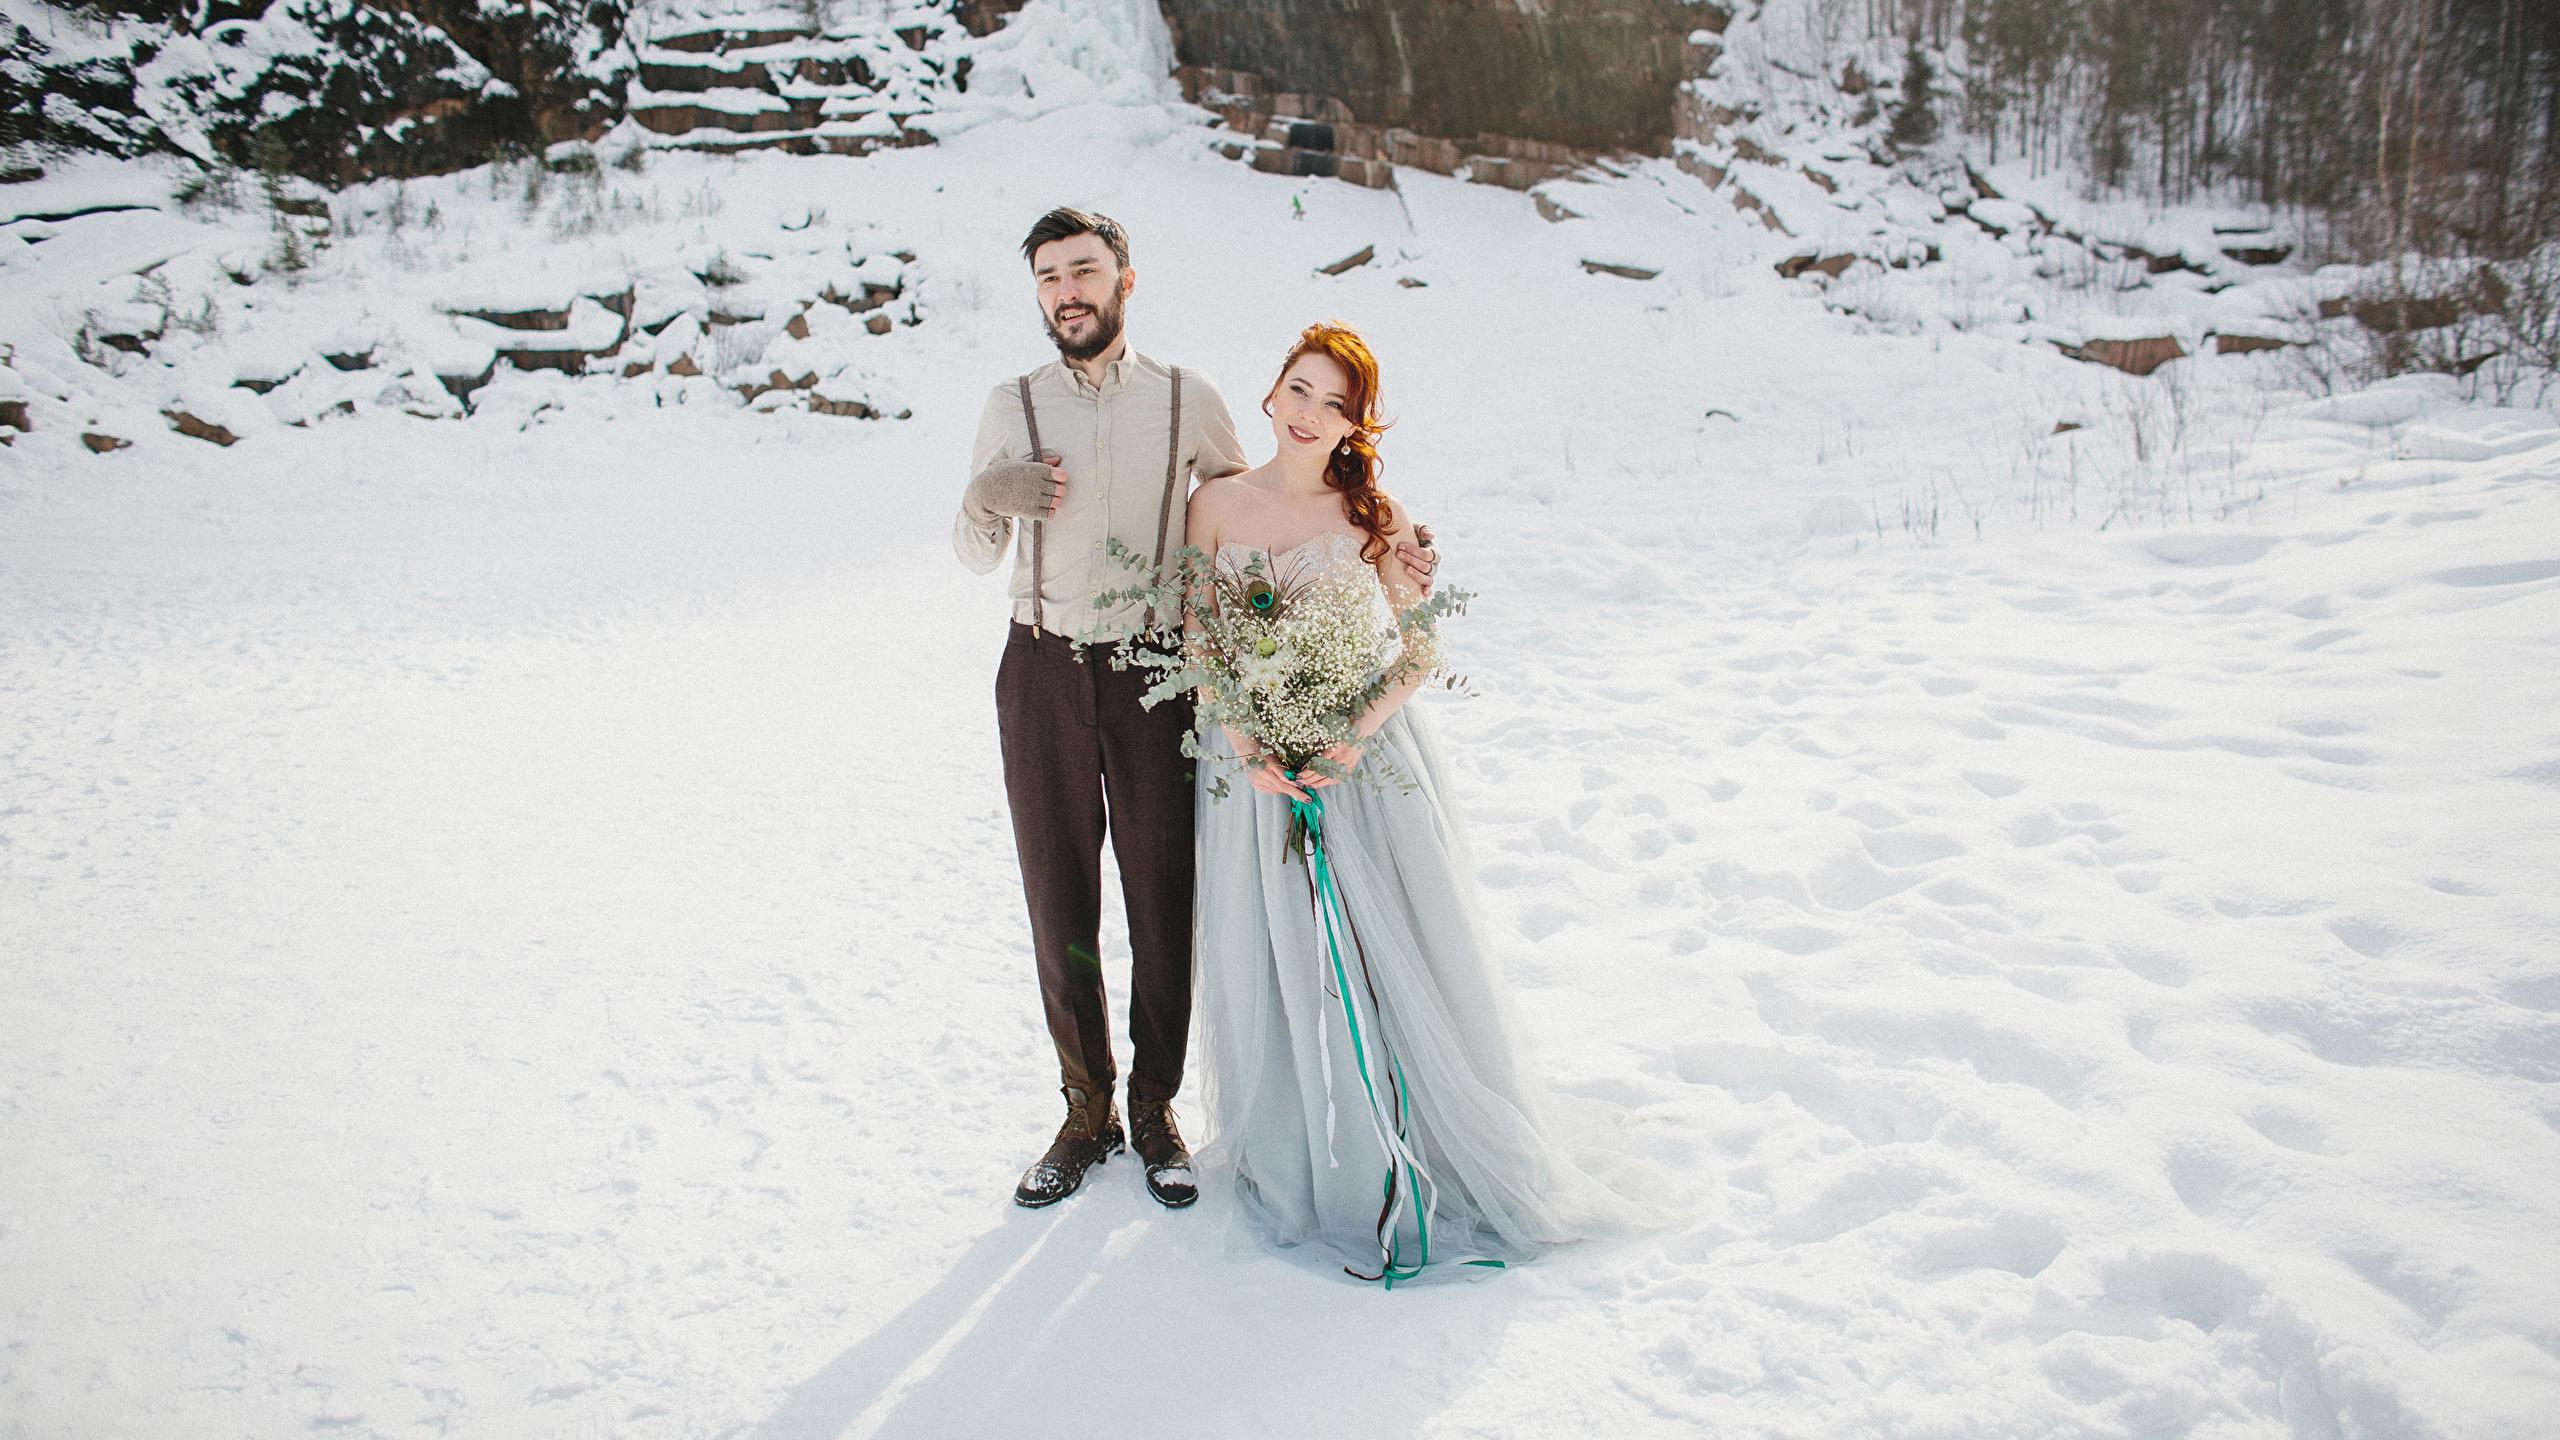 Fotos Bräutigam Braut Sträuße Liebe Winter Mädchens Kleid 2560x1440 bräute